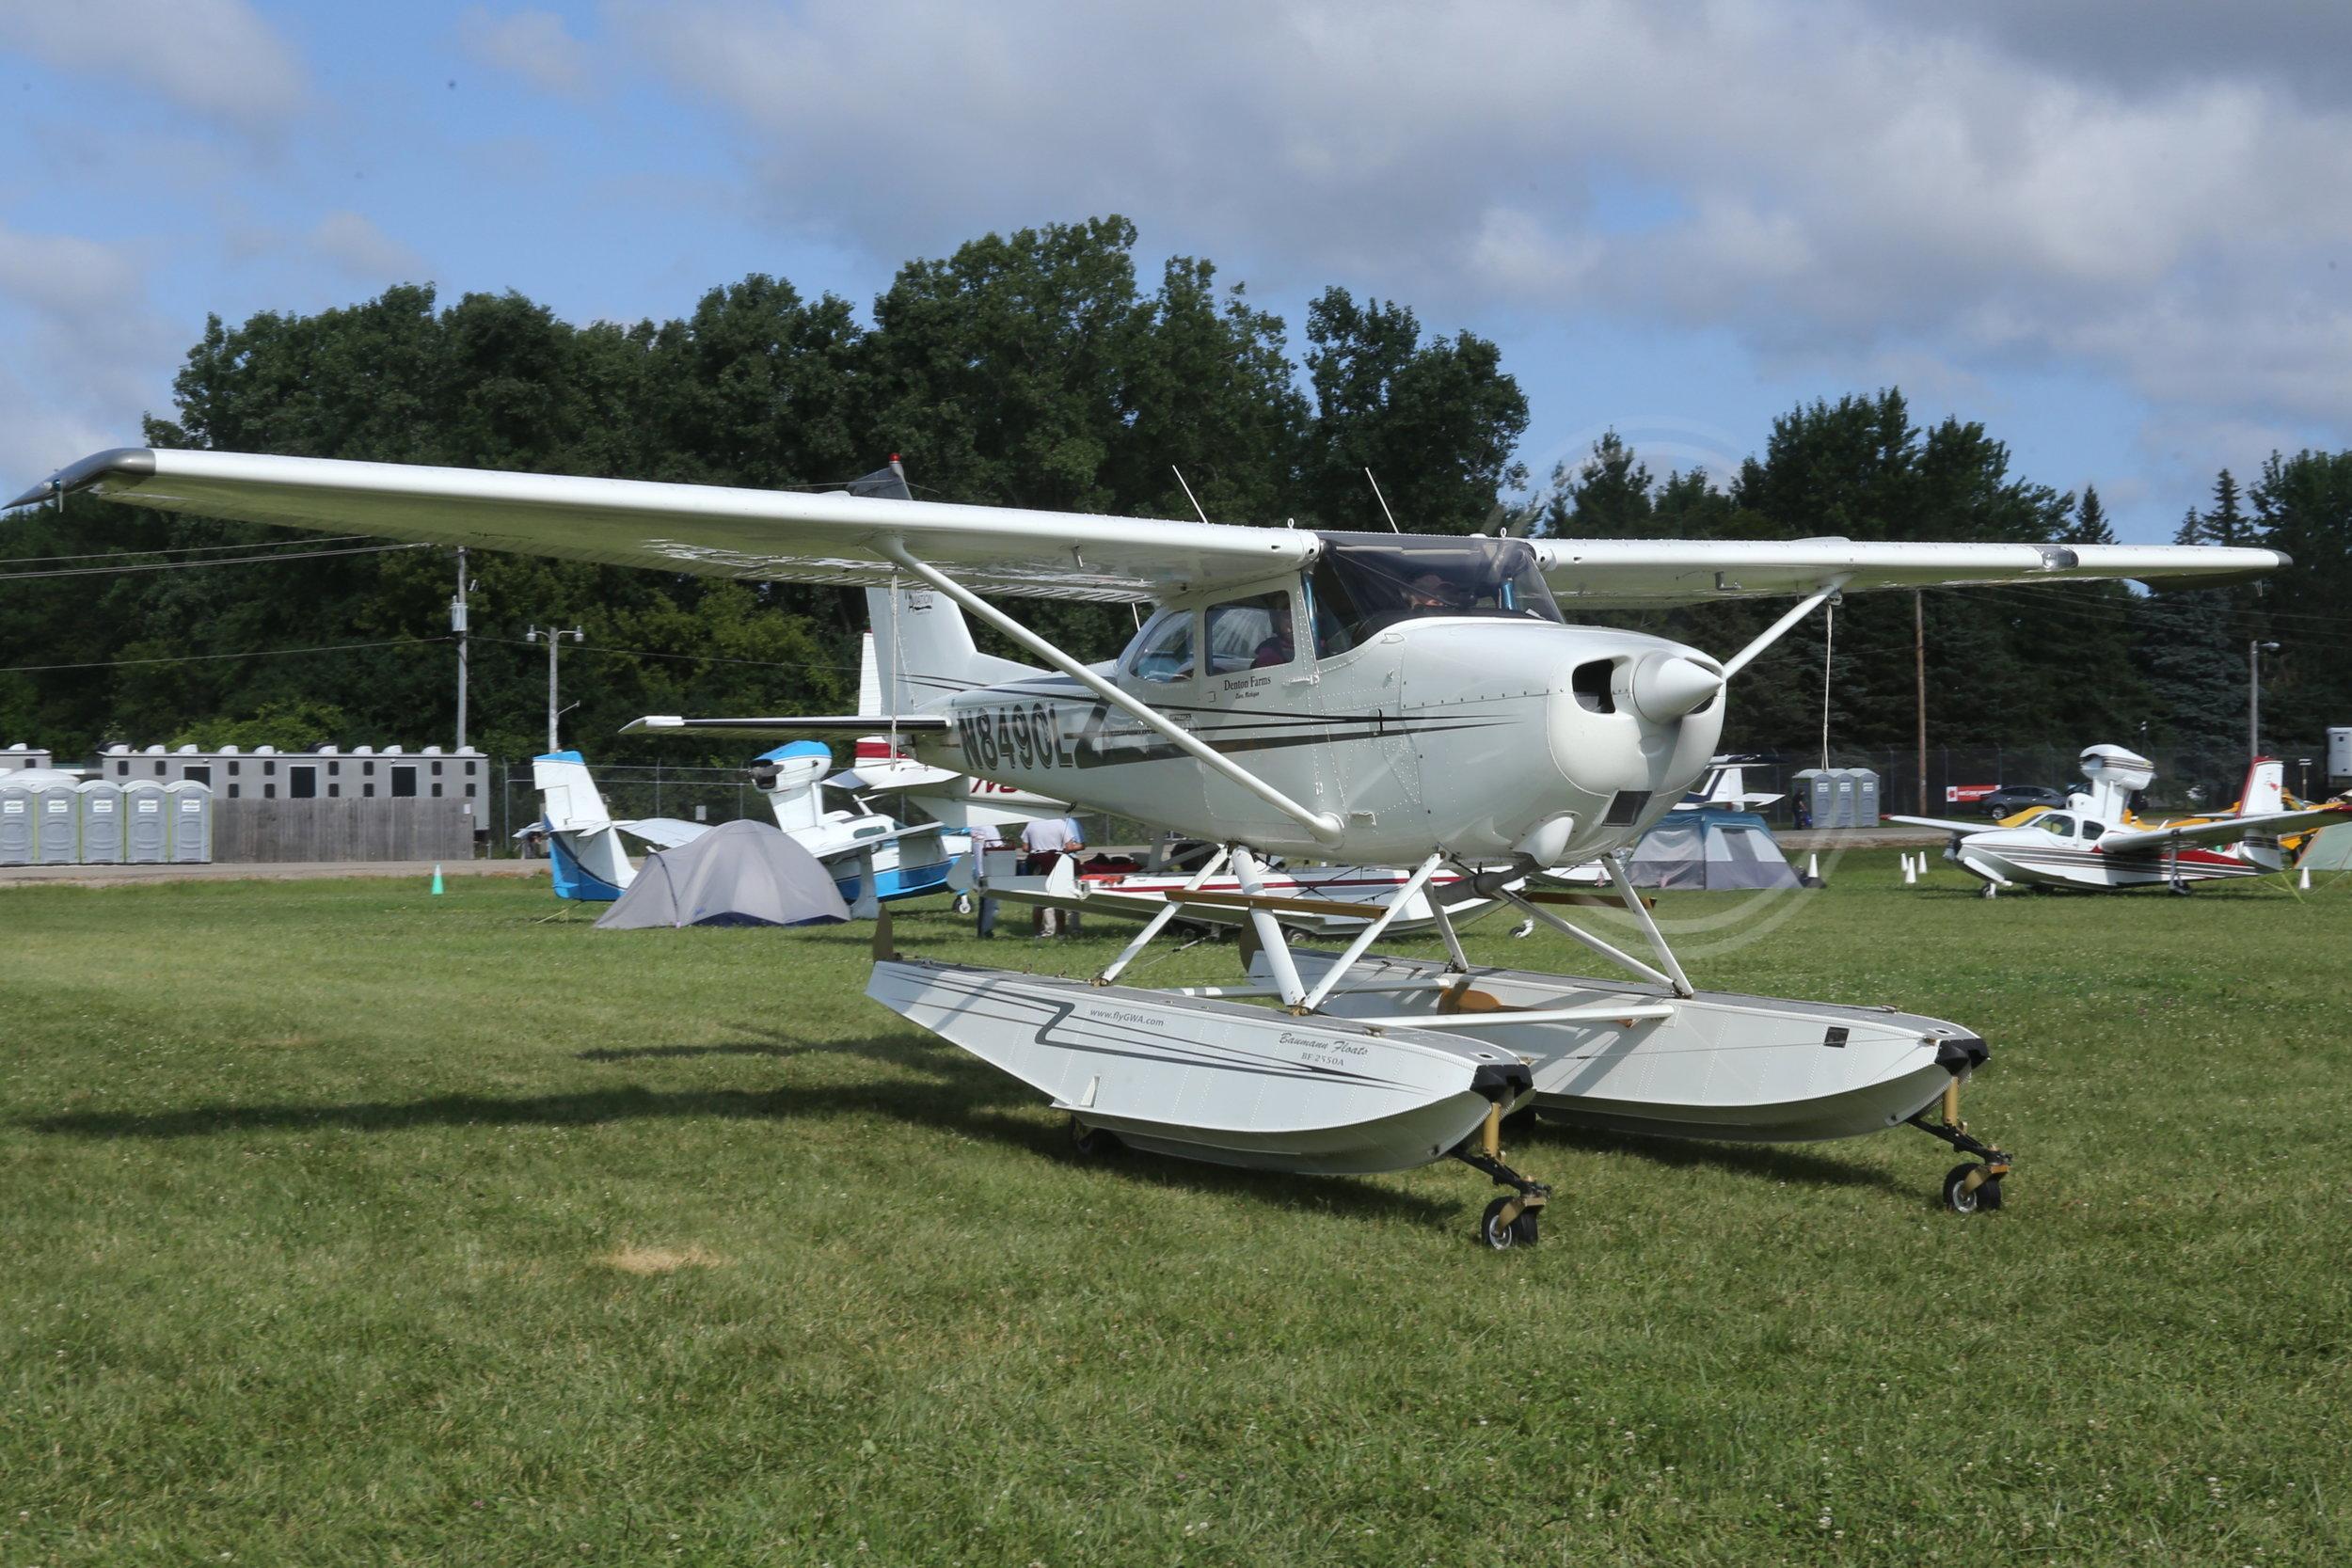 N8490L Denton Farms Cessna 172F taken at Oshkosh 27th July 2018 by John Wood